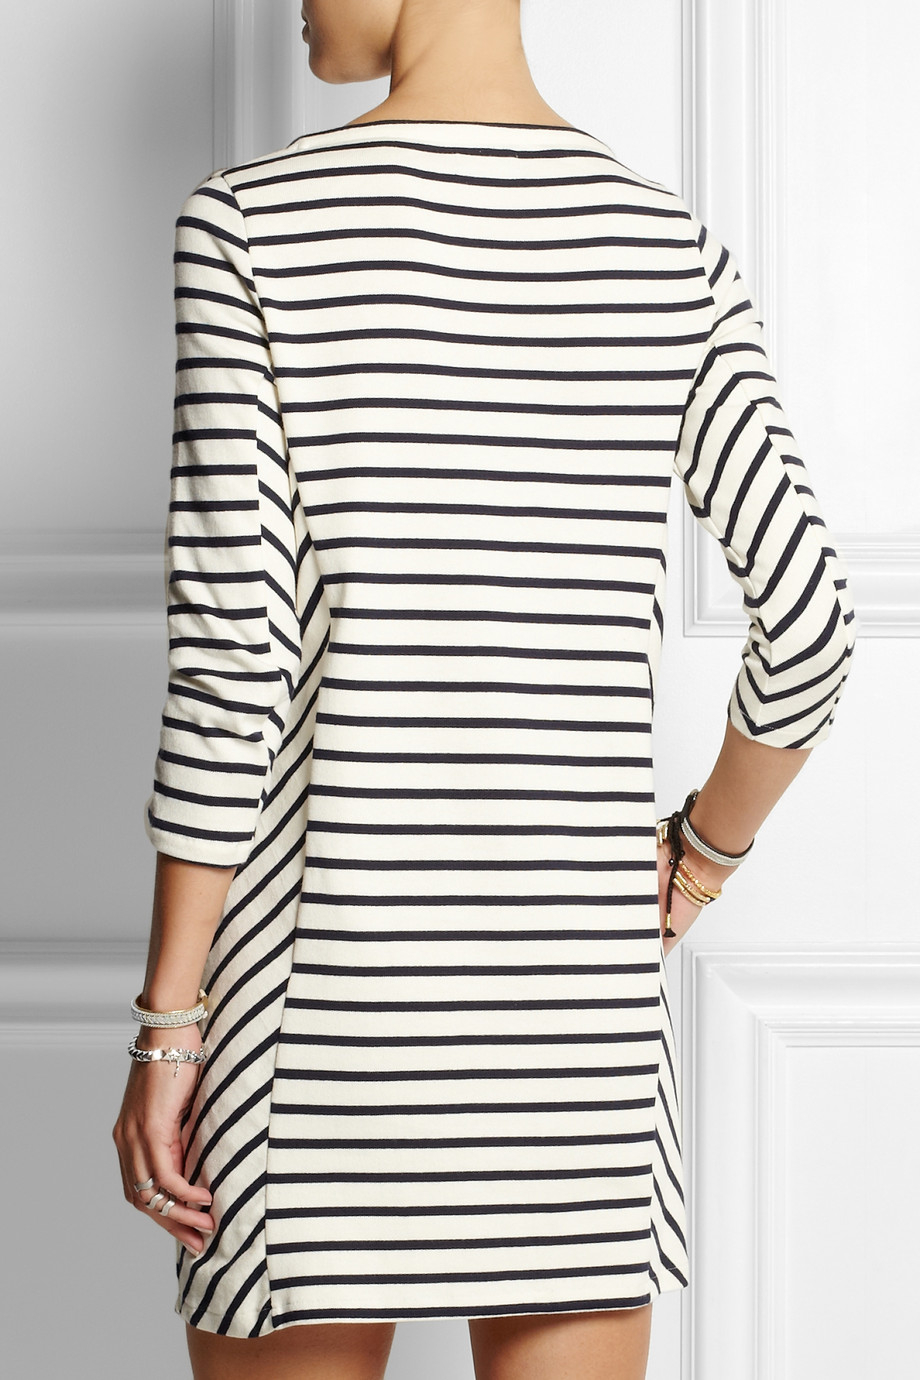 Blue striped cotton dress